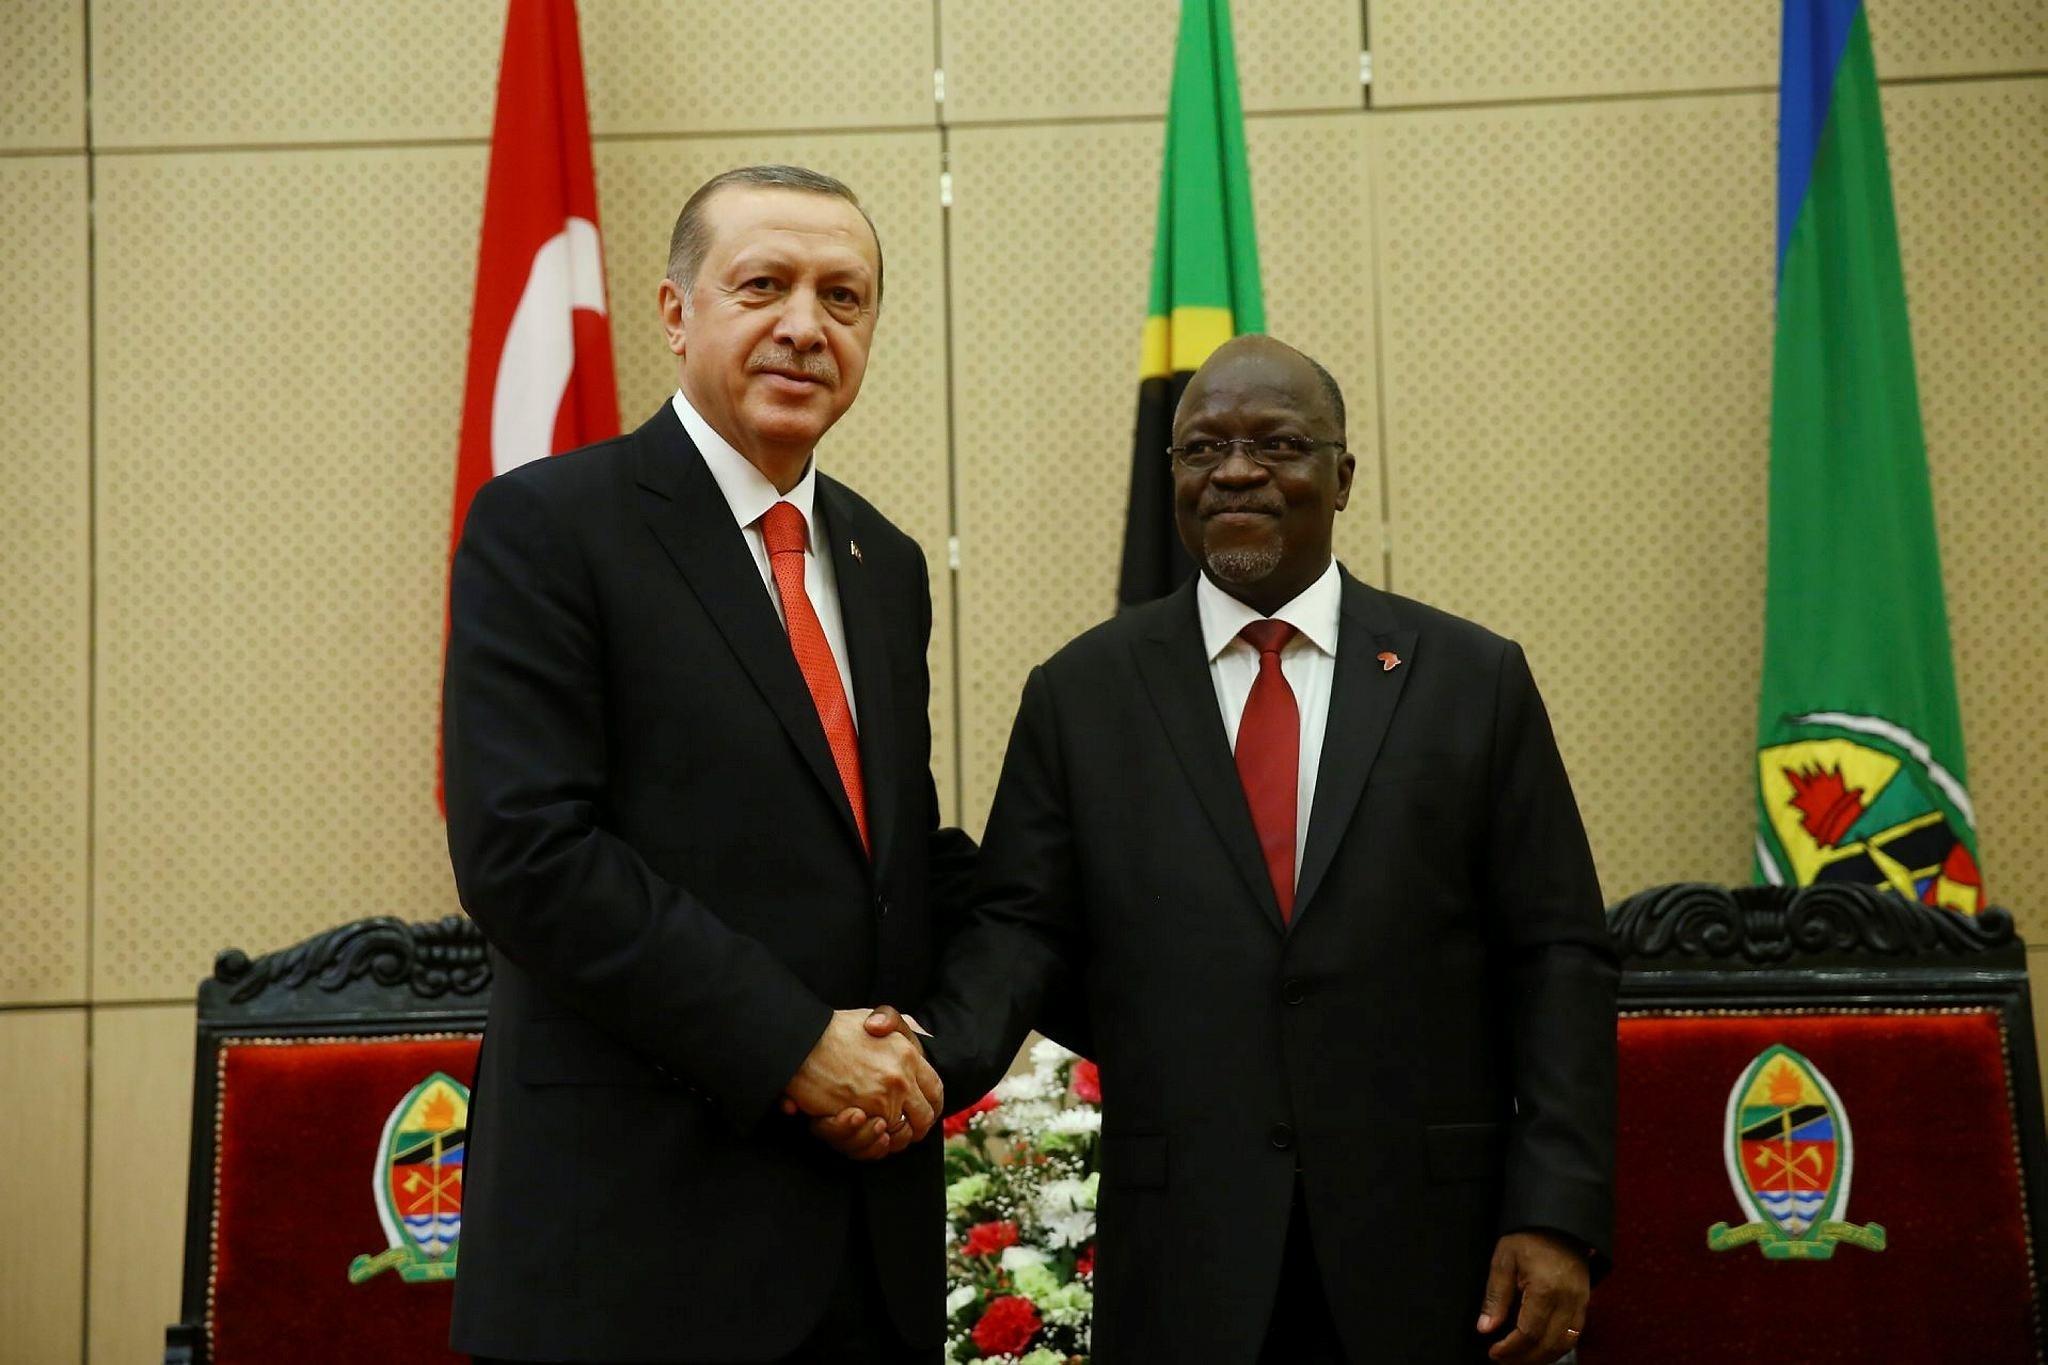 President Recep Tayyip Erdou011fan (L) shakes hands with his Tanzanian counterpart John Pombe Joseph Magufuli